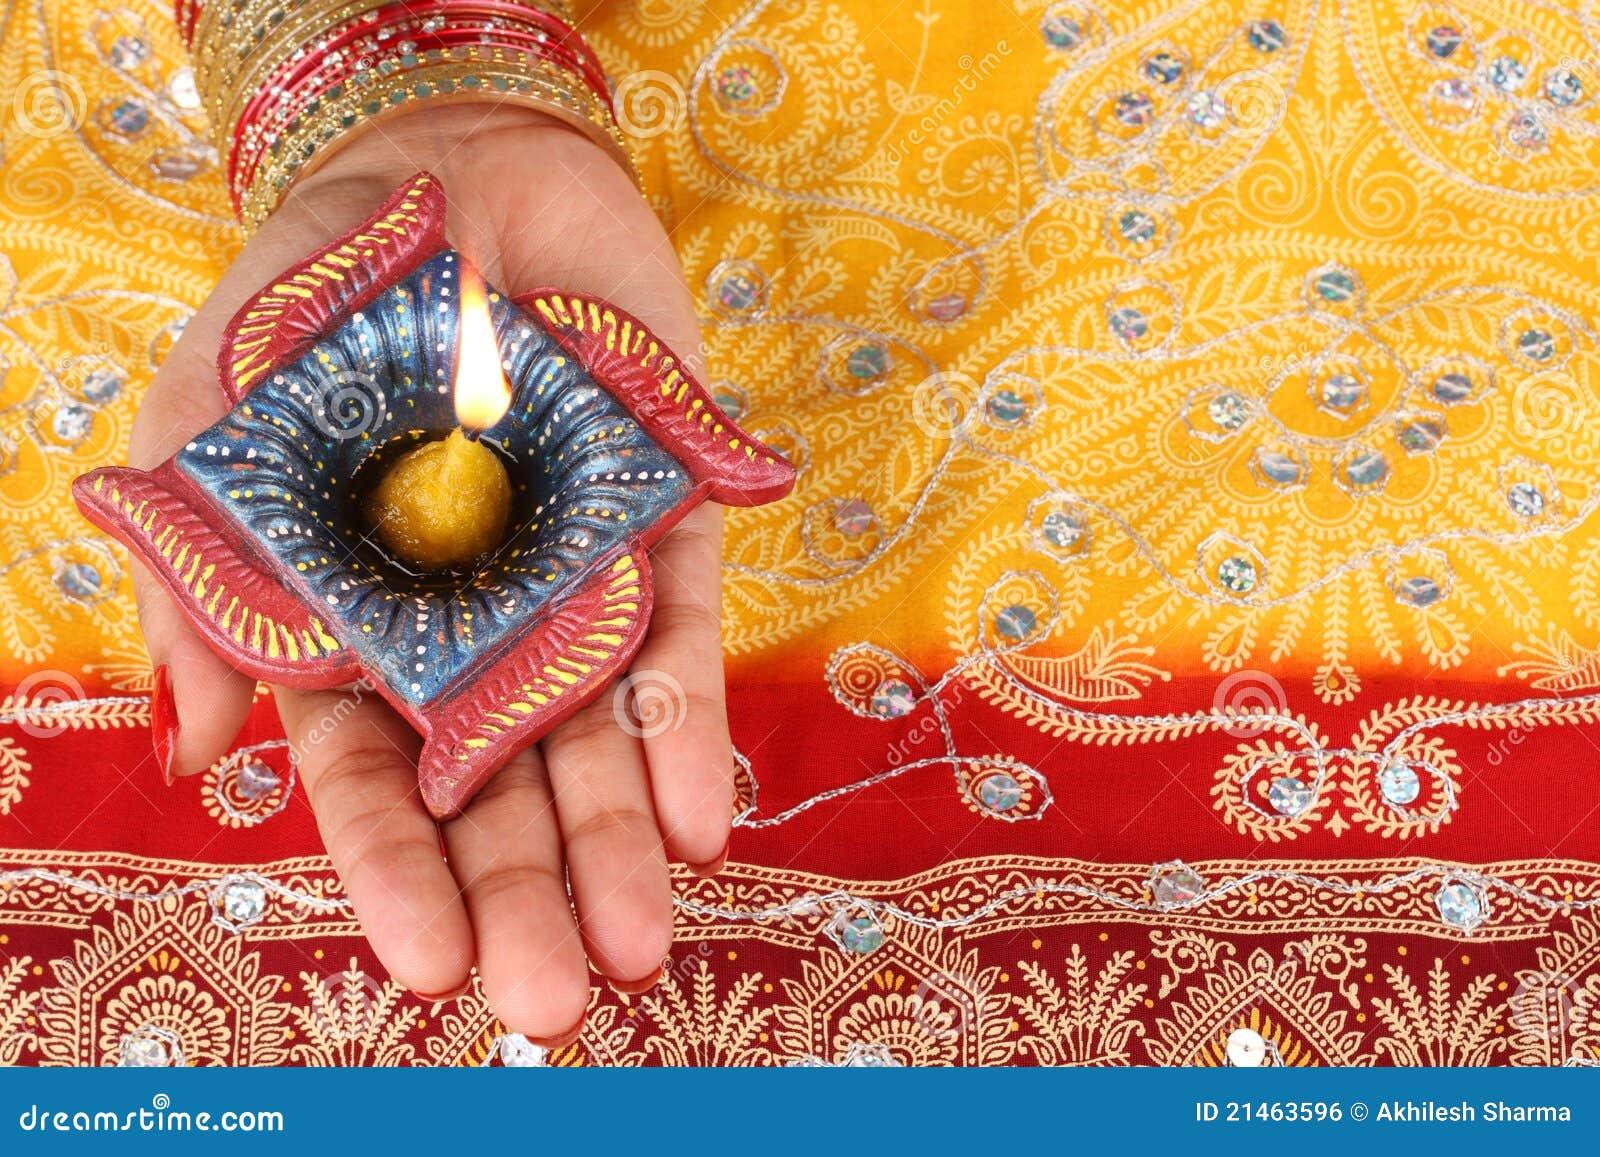 Handmade Diwali Diya Lamp Royalty Free Stock Image - Image: 21463596